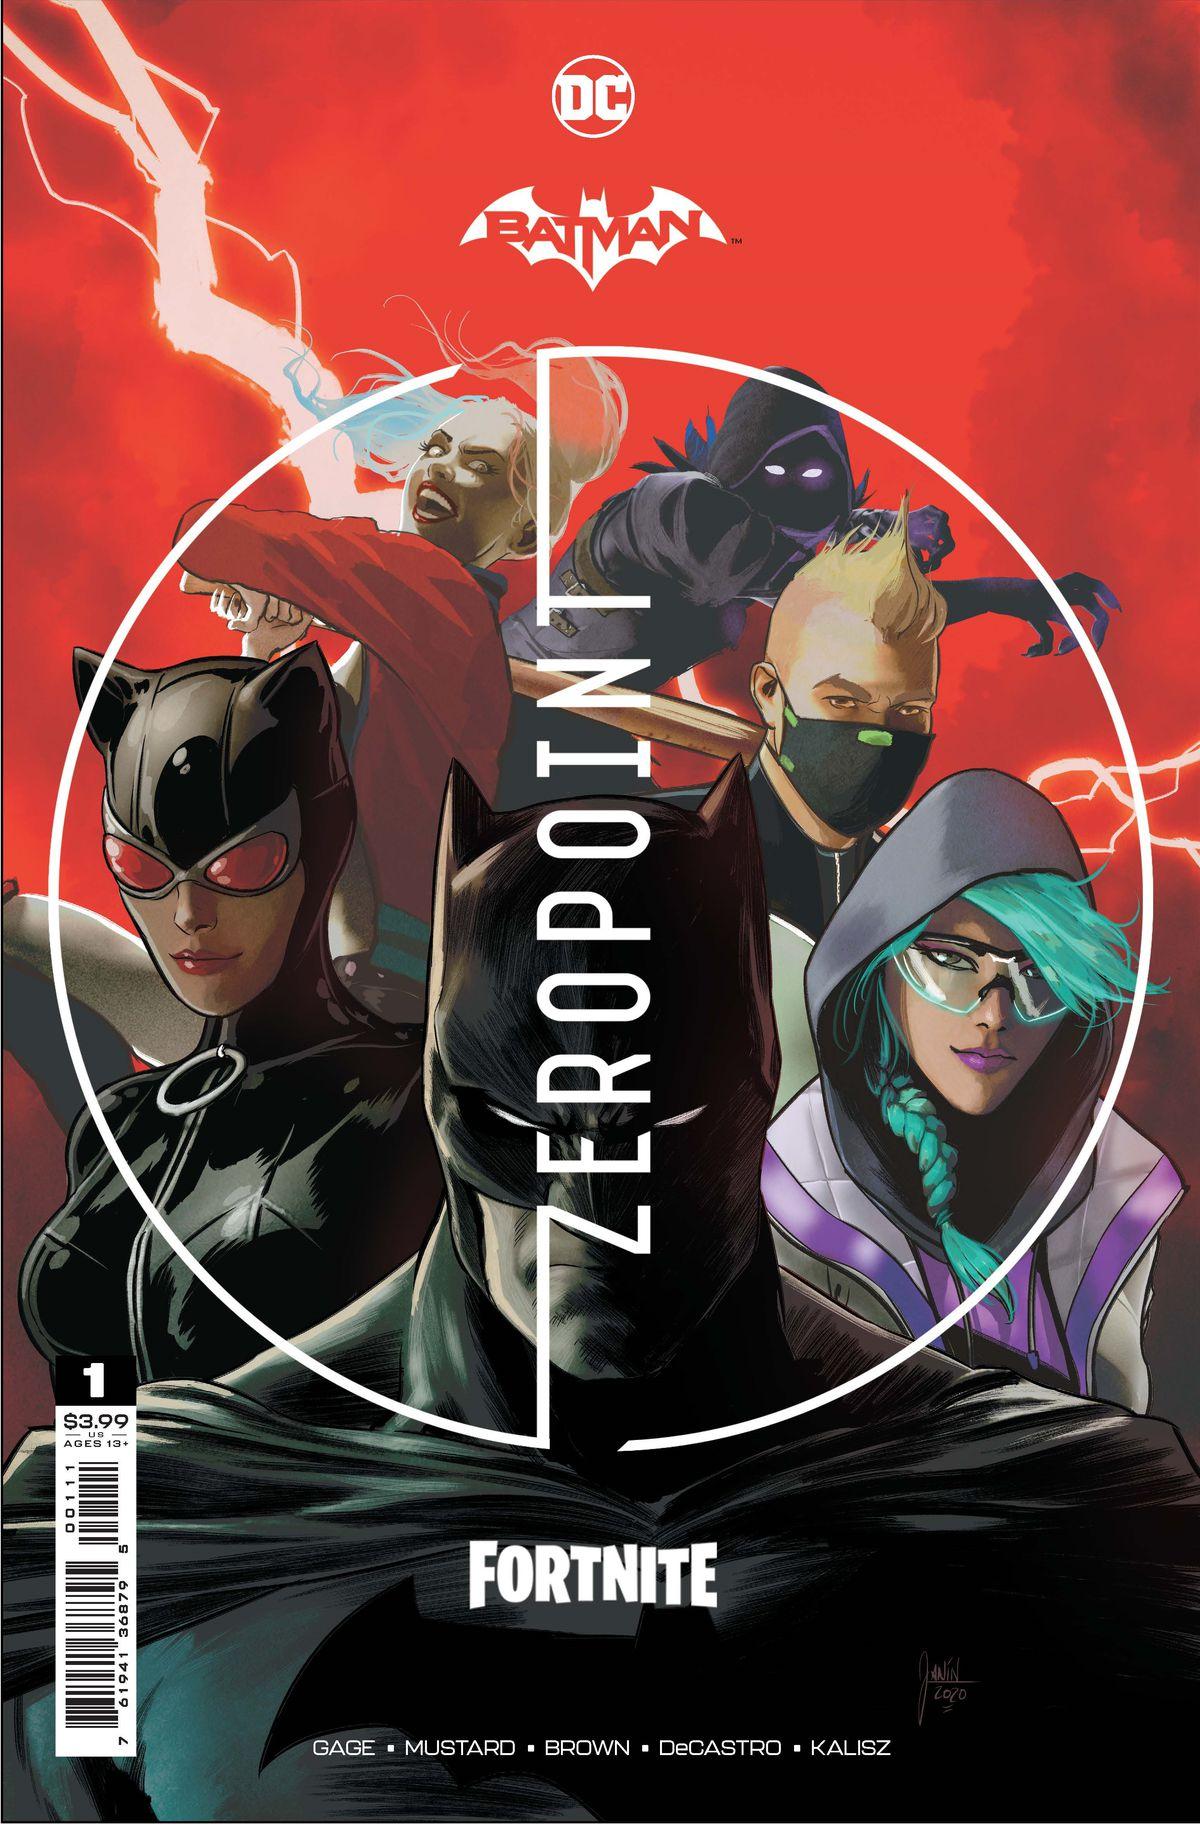 Cover art for Batman/Fortnite: Zero Point #1